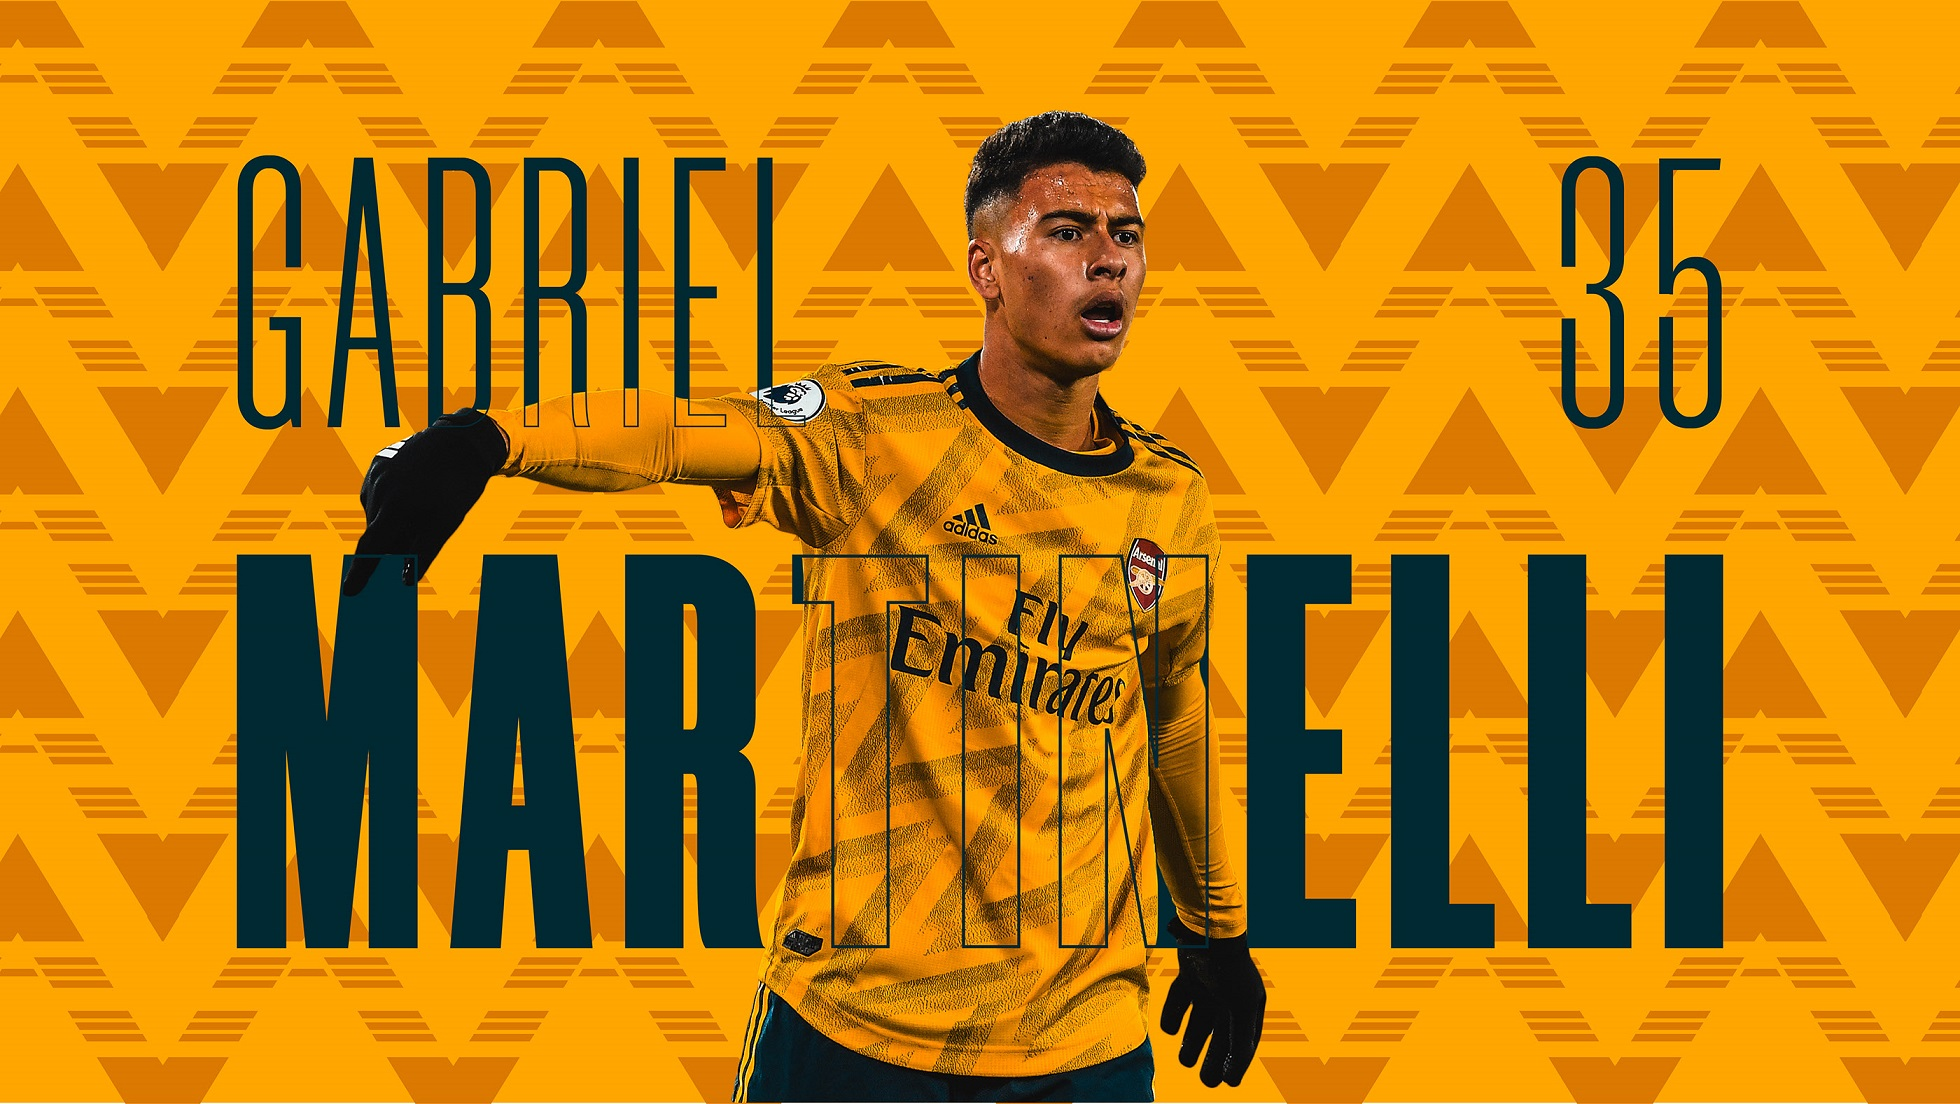 gabriel martinelli wallpapers arsenal